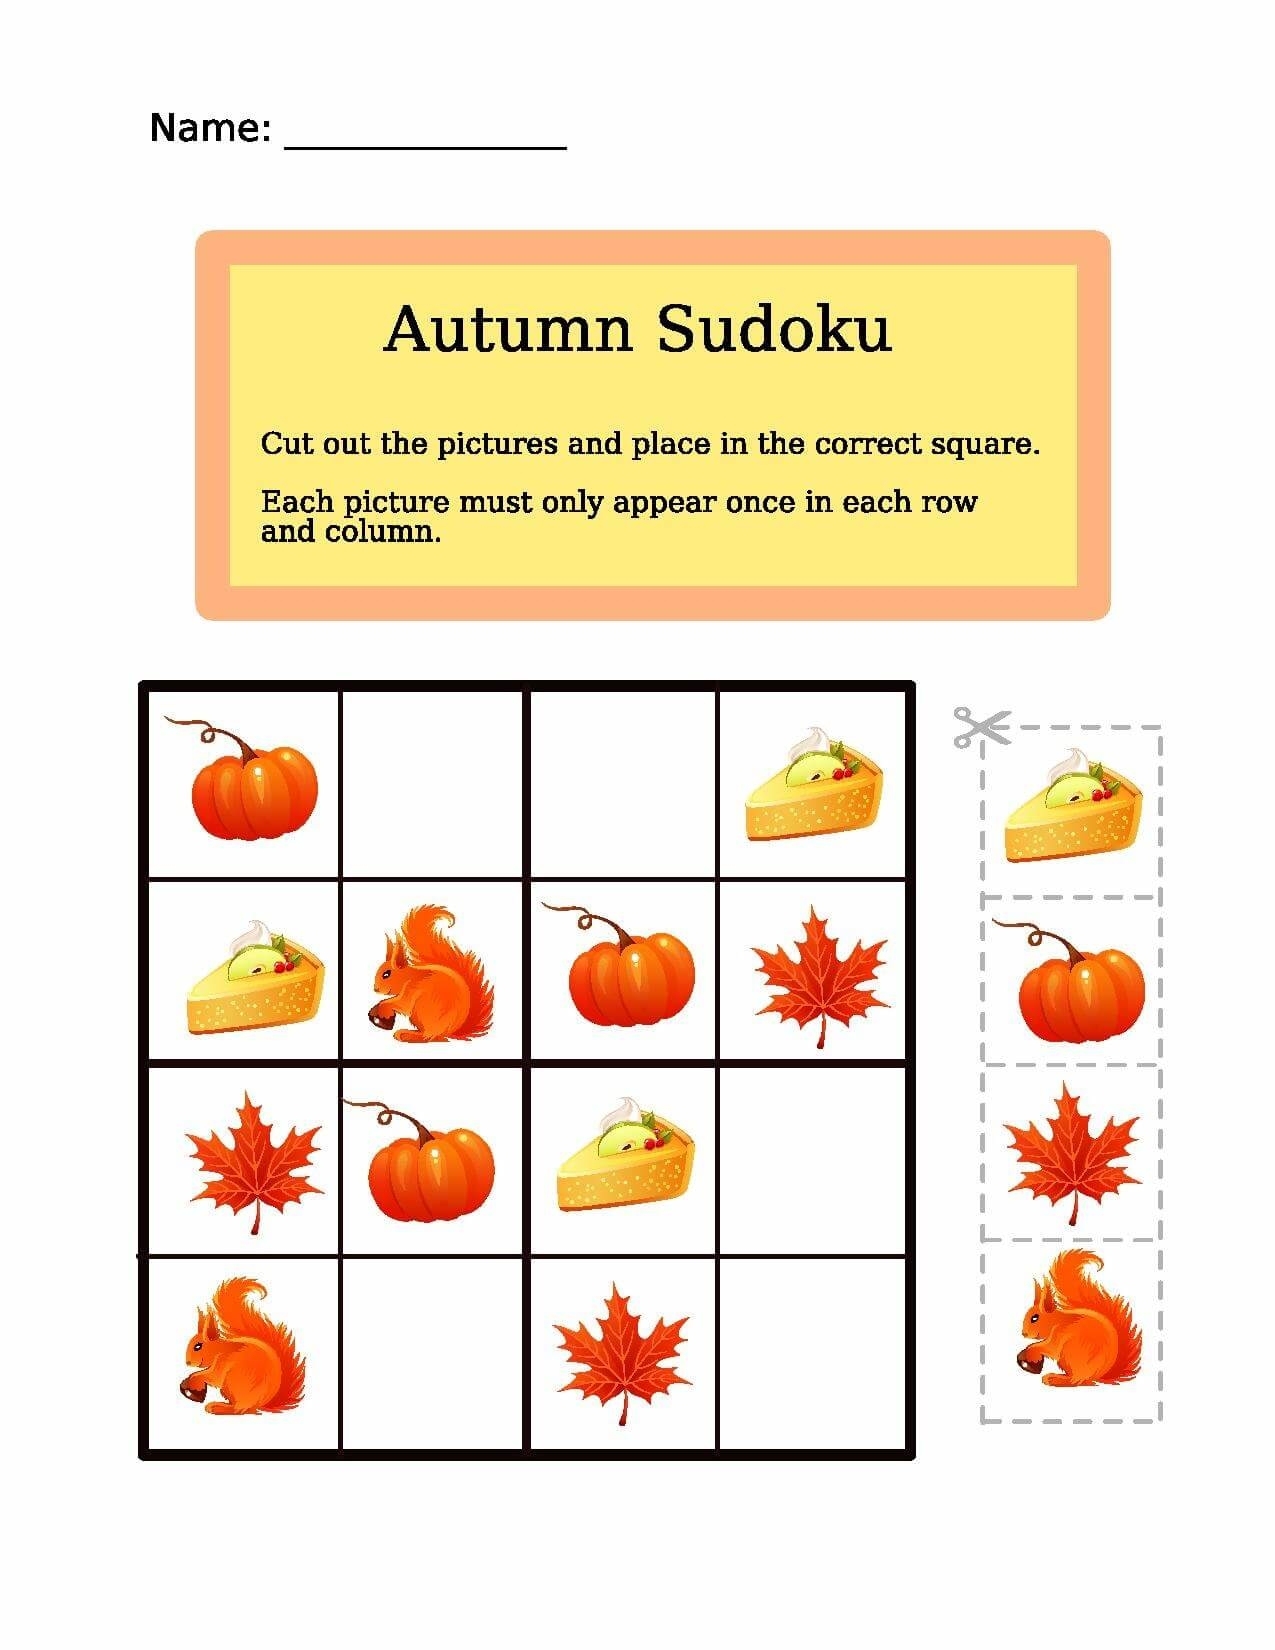 Autumn Sudoku Puzzle